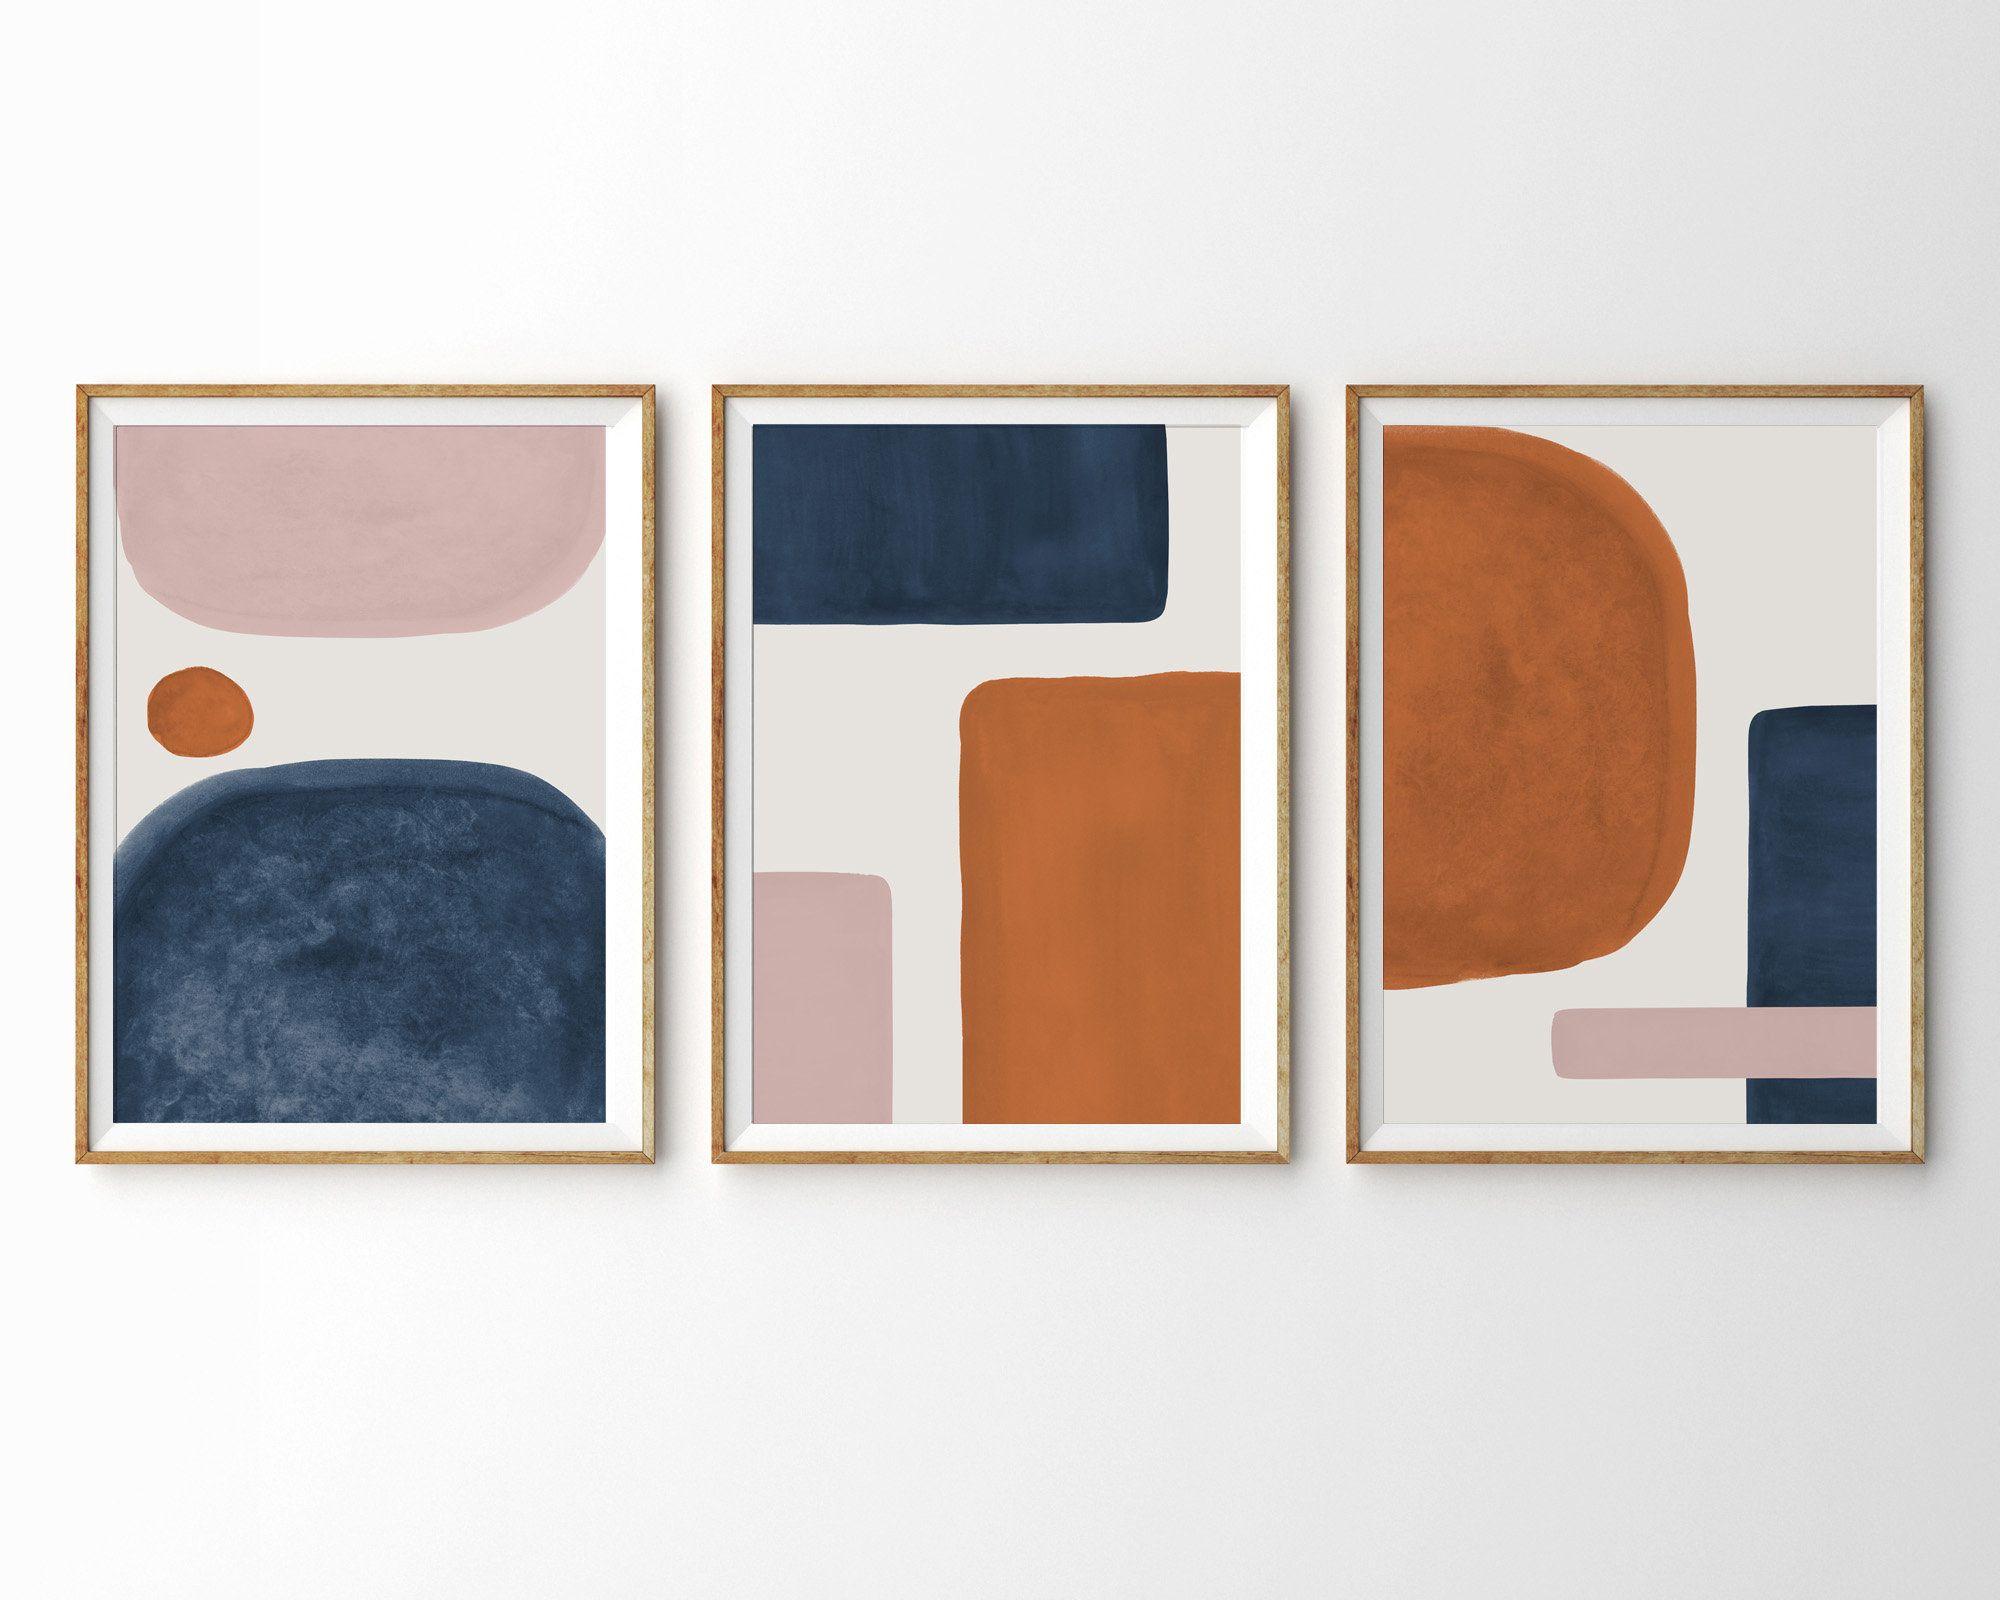 Modern Prints Set Of 3 Prints Modern Abstract Art Abstract Print Abstract Wall Art Shapes Wall Art Printable Artwork Contemporary Art